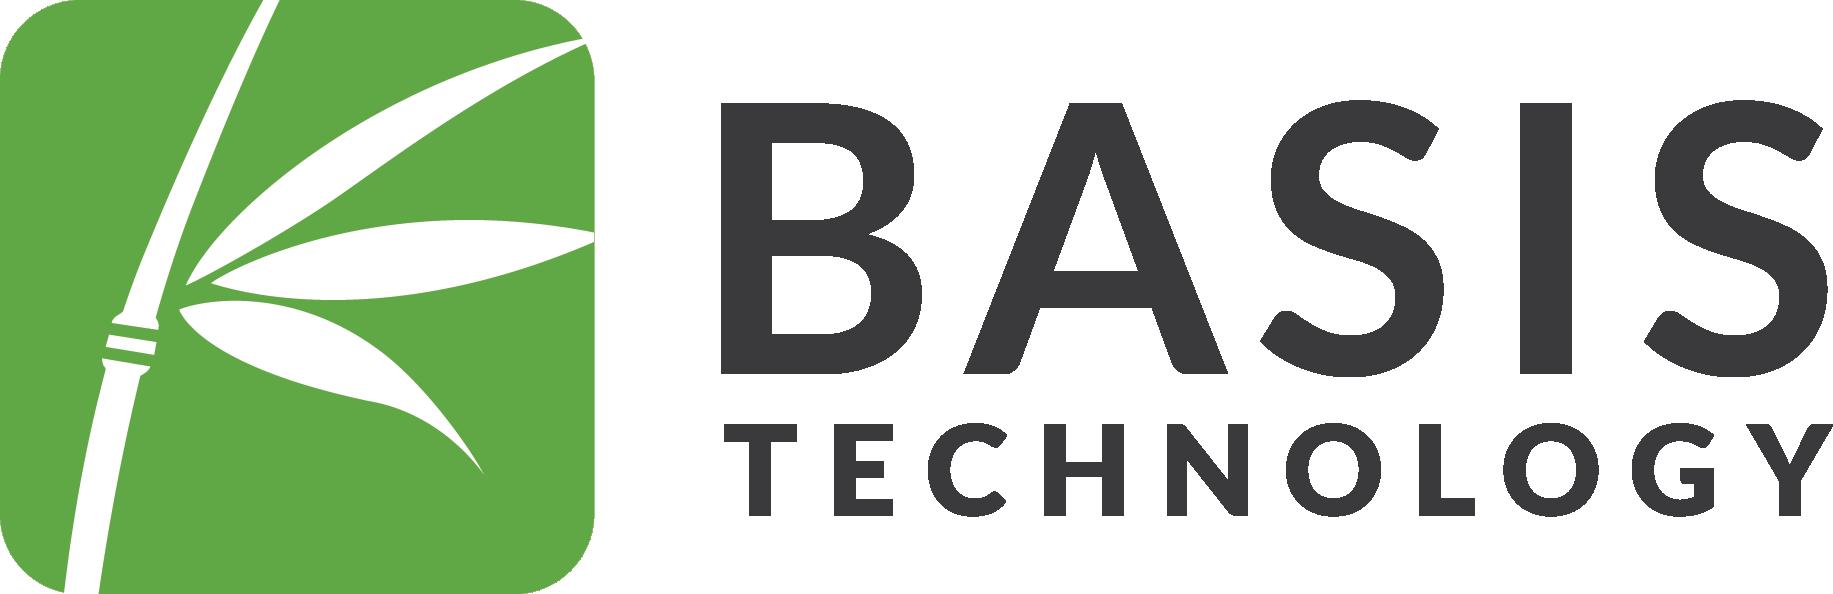 Autopsy Basis Technology Download Lengkap